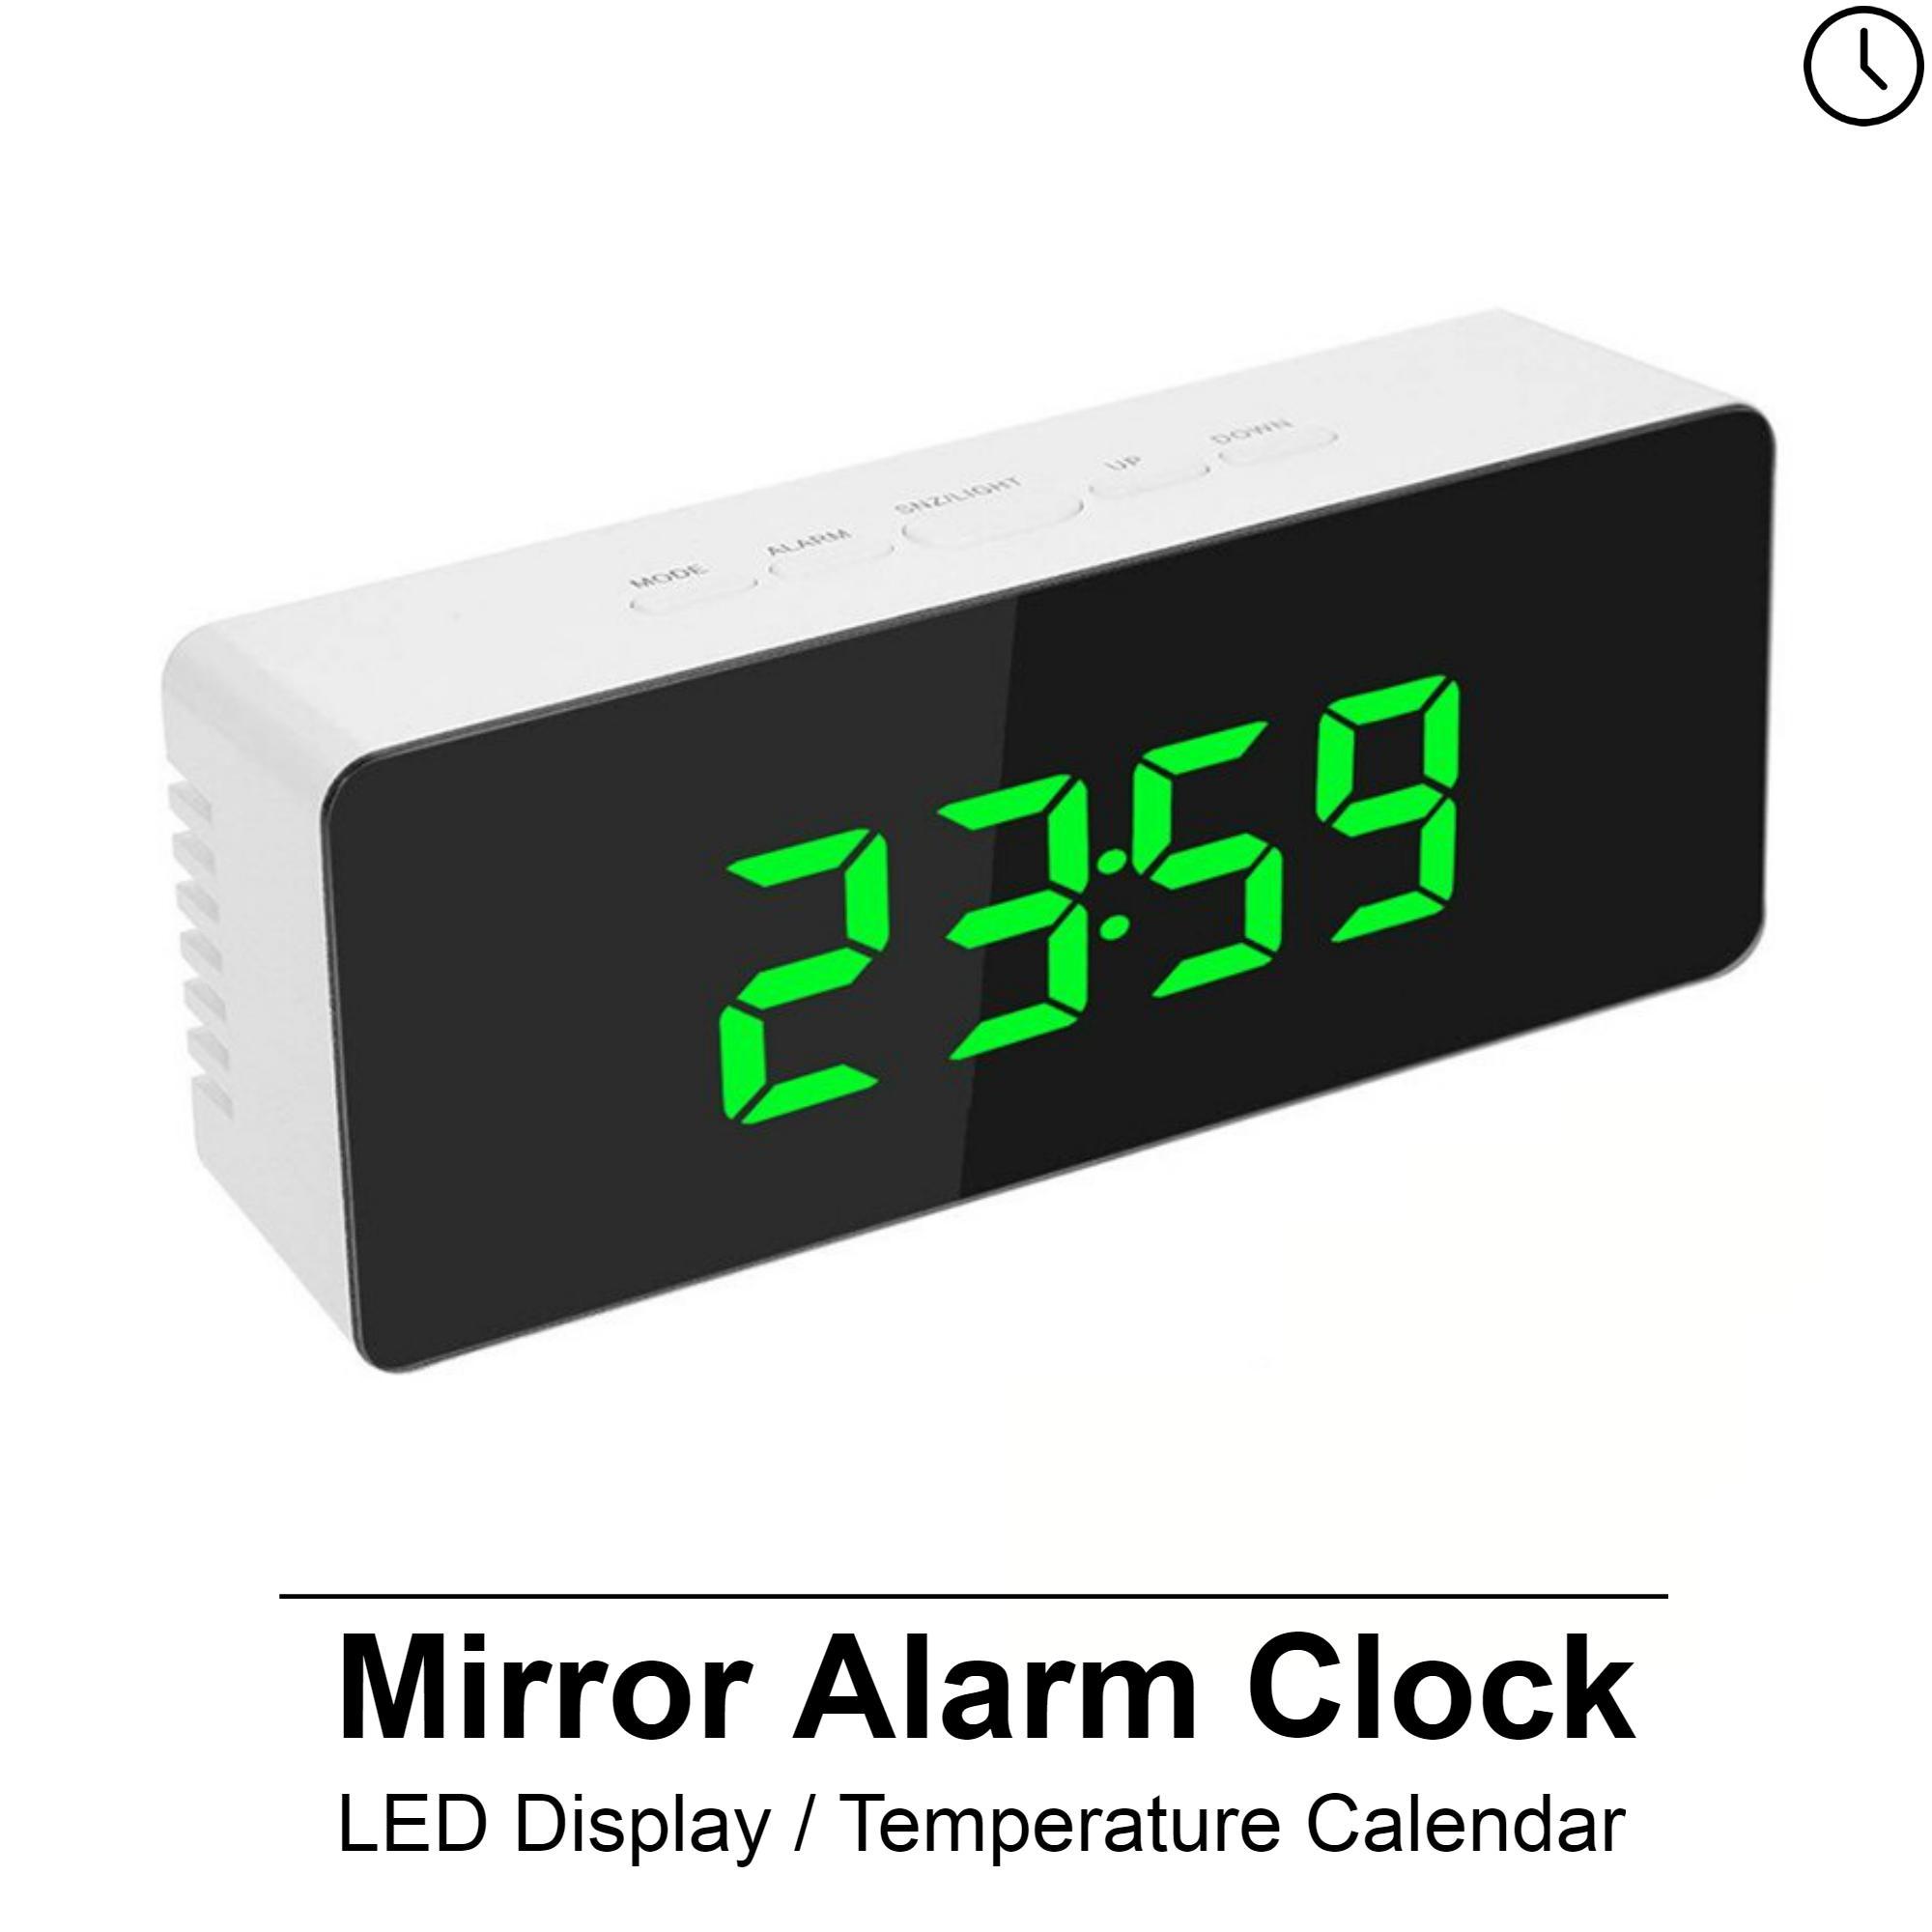 Digital Mirror LED Display Alarm Clock Temperature Calendar USB/AAA Powered Electronic Multifunction Snooze Desk Clock (SG Warranty)